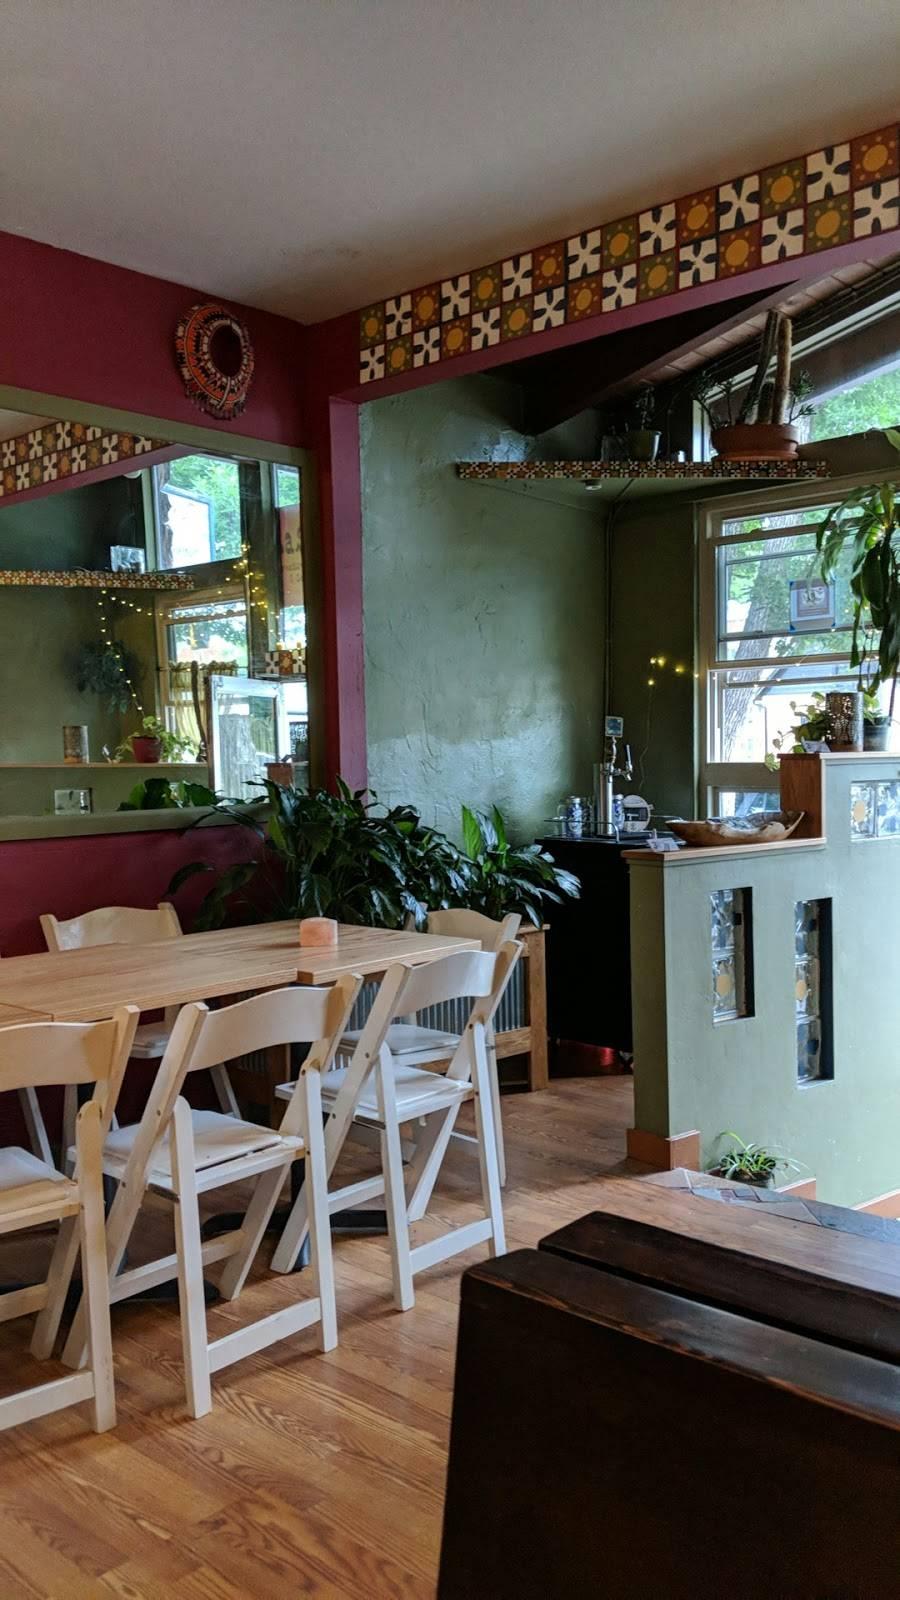 Raska International Cuisine & Sauce | restaurant | 128a W Laurel St, Fort Collins, CO 80524, USA | 9705813894 OR +1 970-581-3894